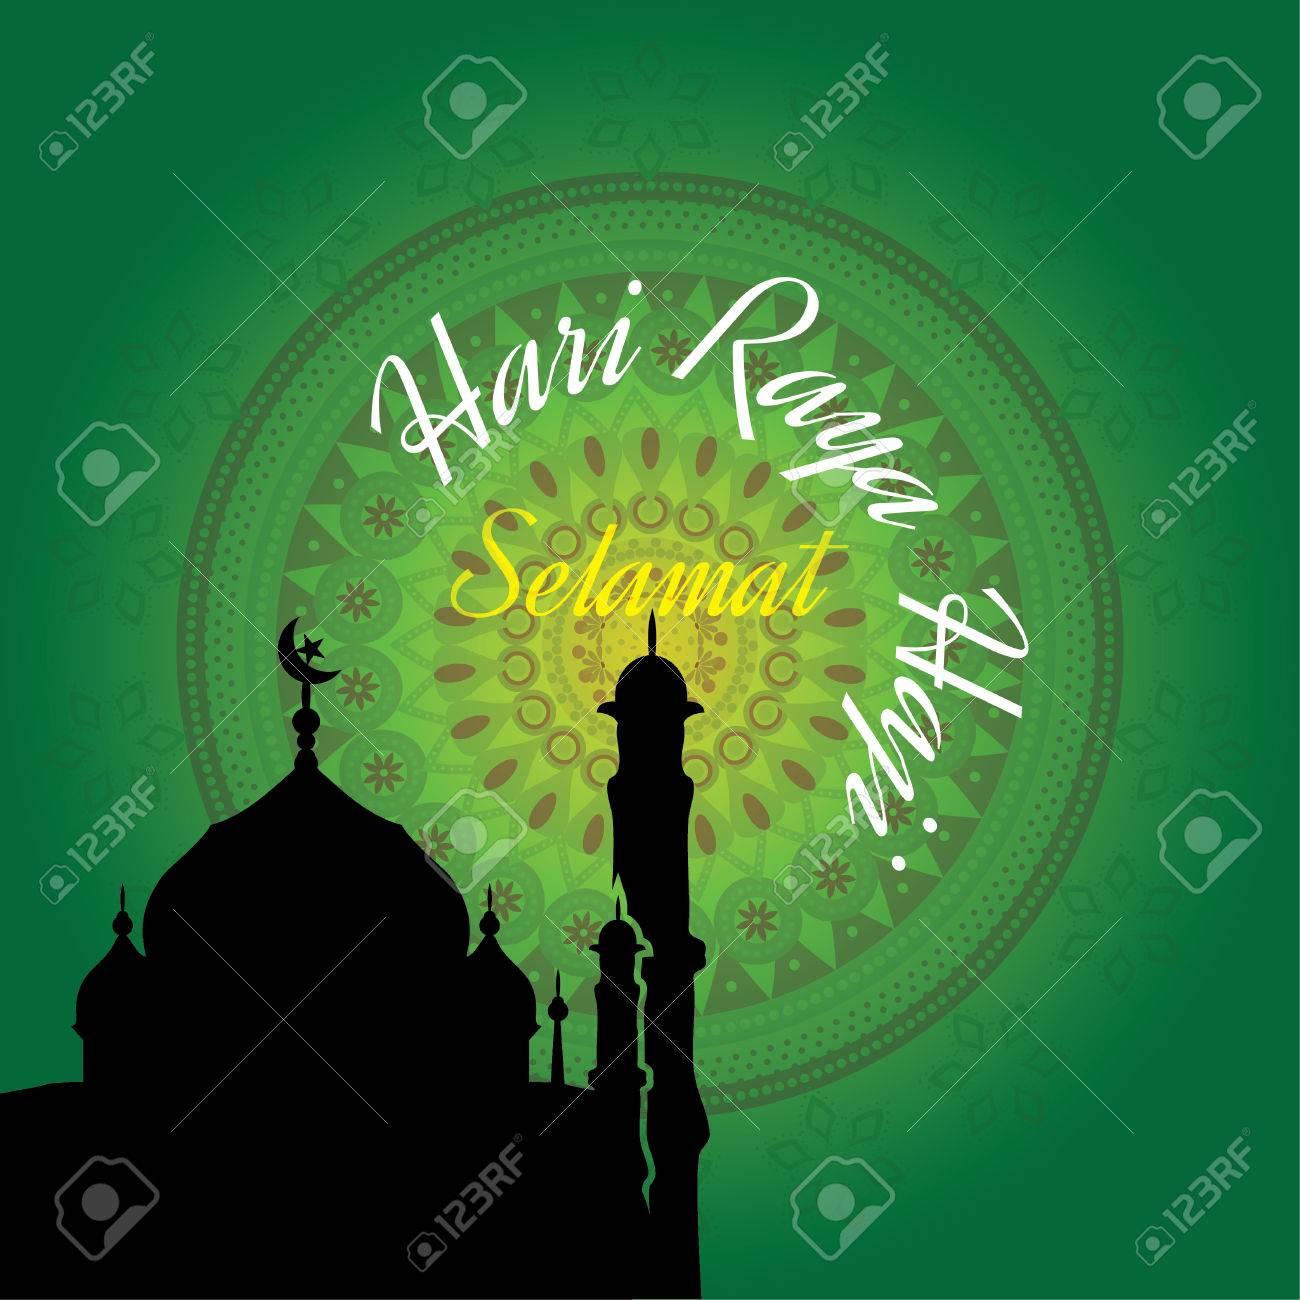 Selamat hari raya haji greeting card royalty free cliparts selamat hari raya haji greeting card stock vector 53498667 kristyandbryce Image collections